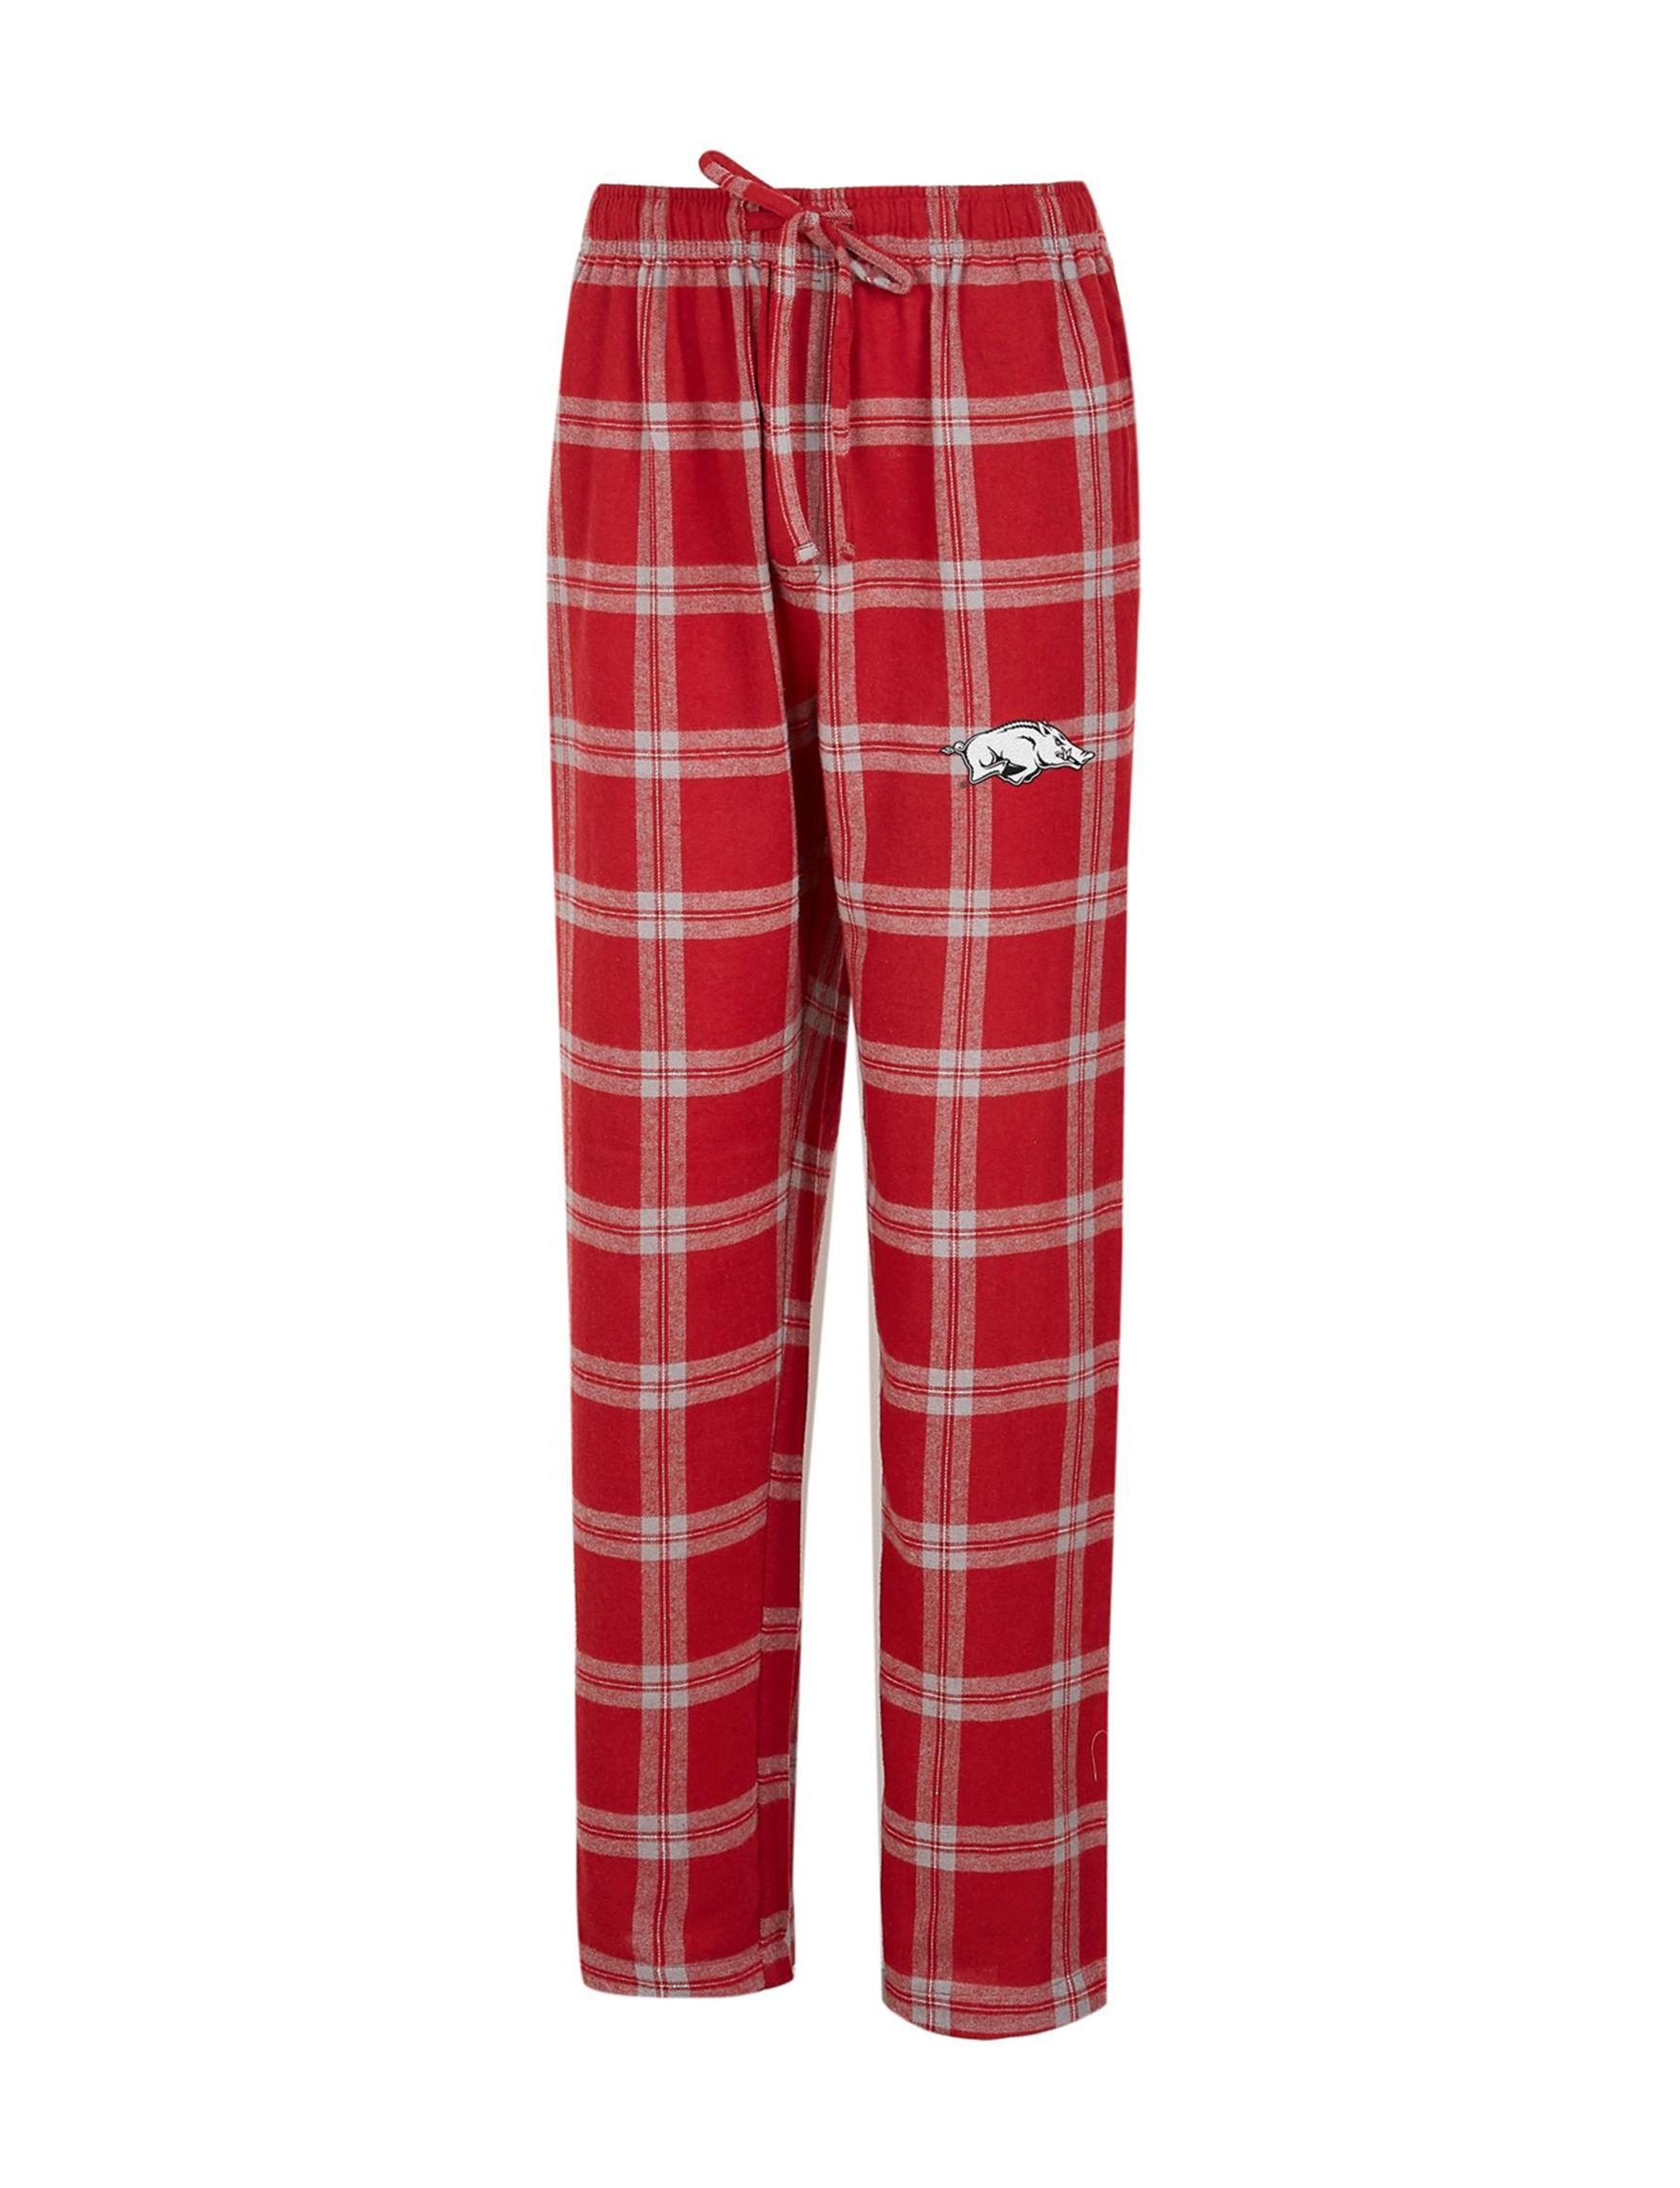 NCAA Red / Grey Pajama Bottoms